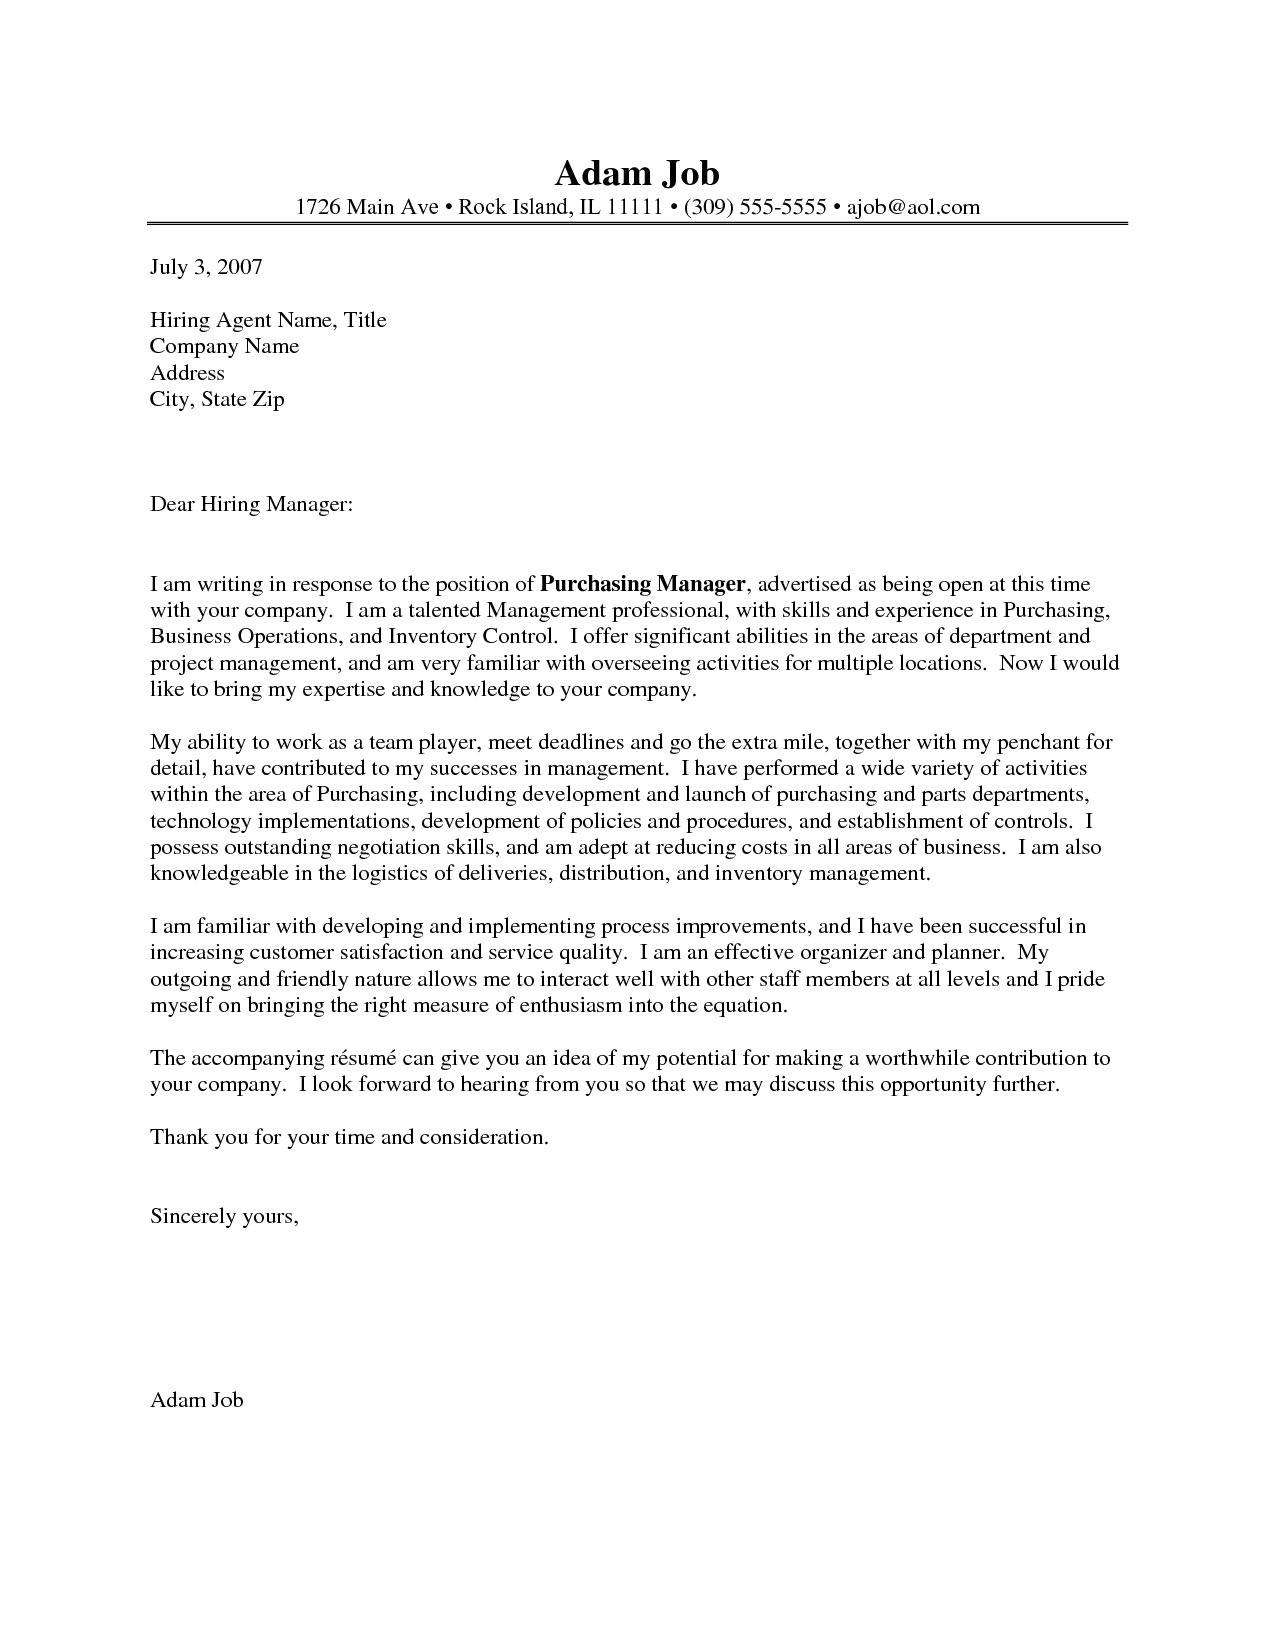 Cover Letter for Purchasing Manager Procurement Officer Resume Cover Letter Bongdaao Com